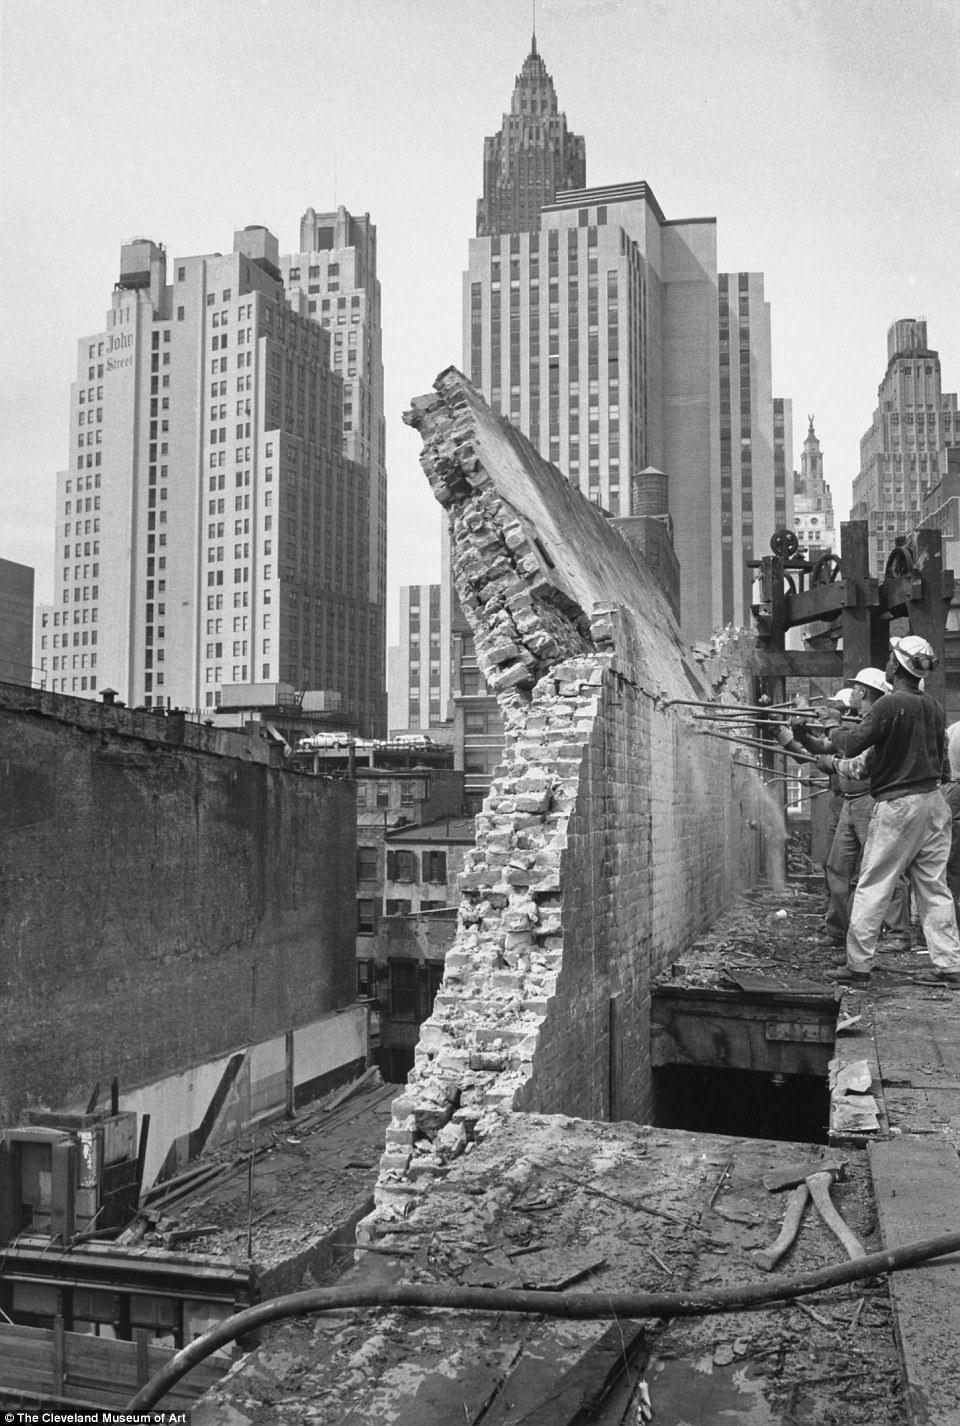 Destruction Of Old Nyc 60s Photos Show Lower Manhattan